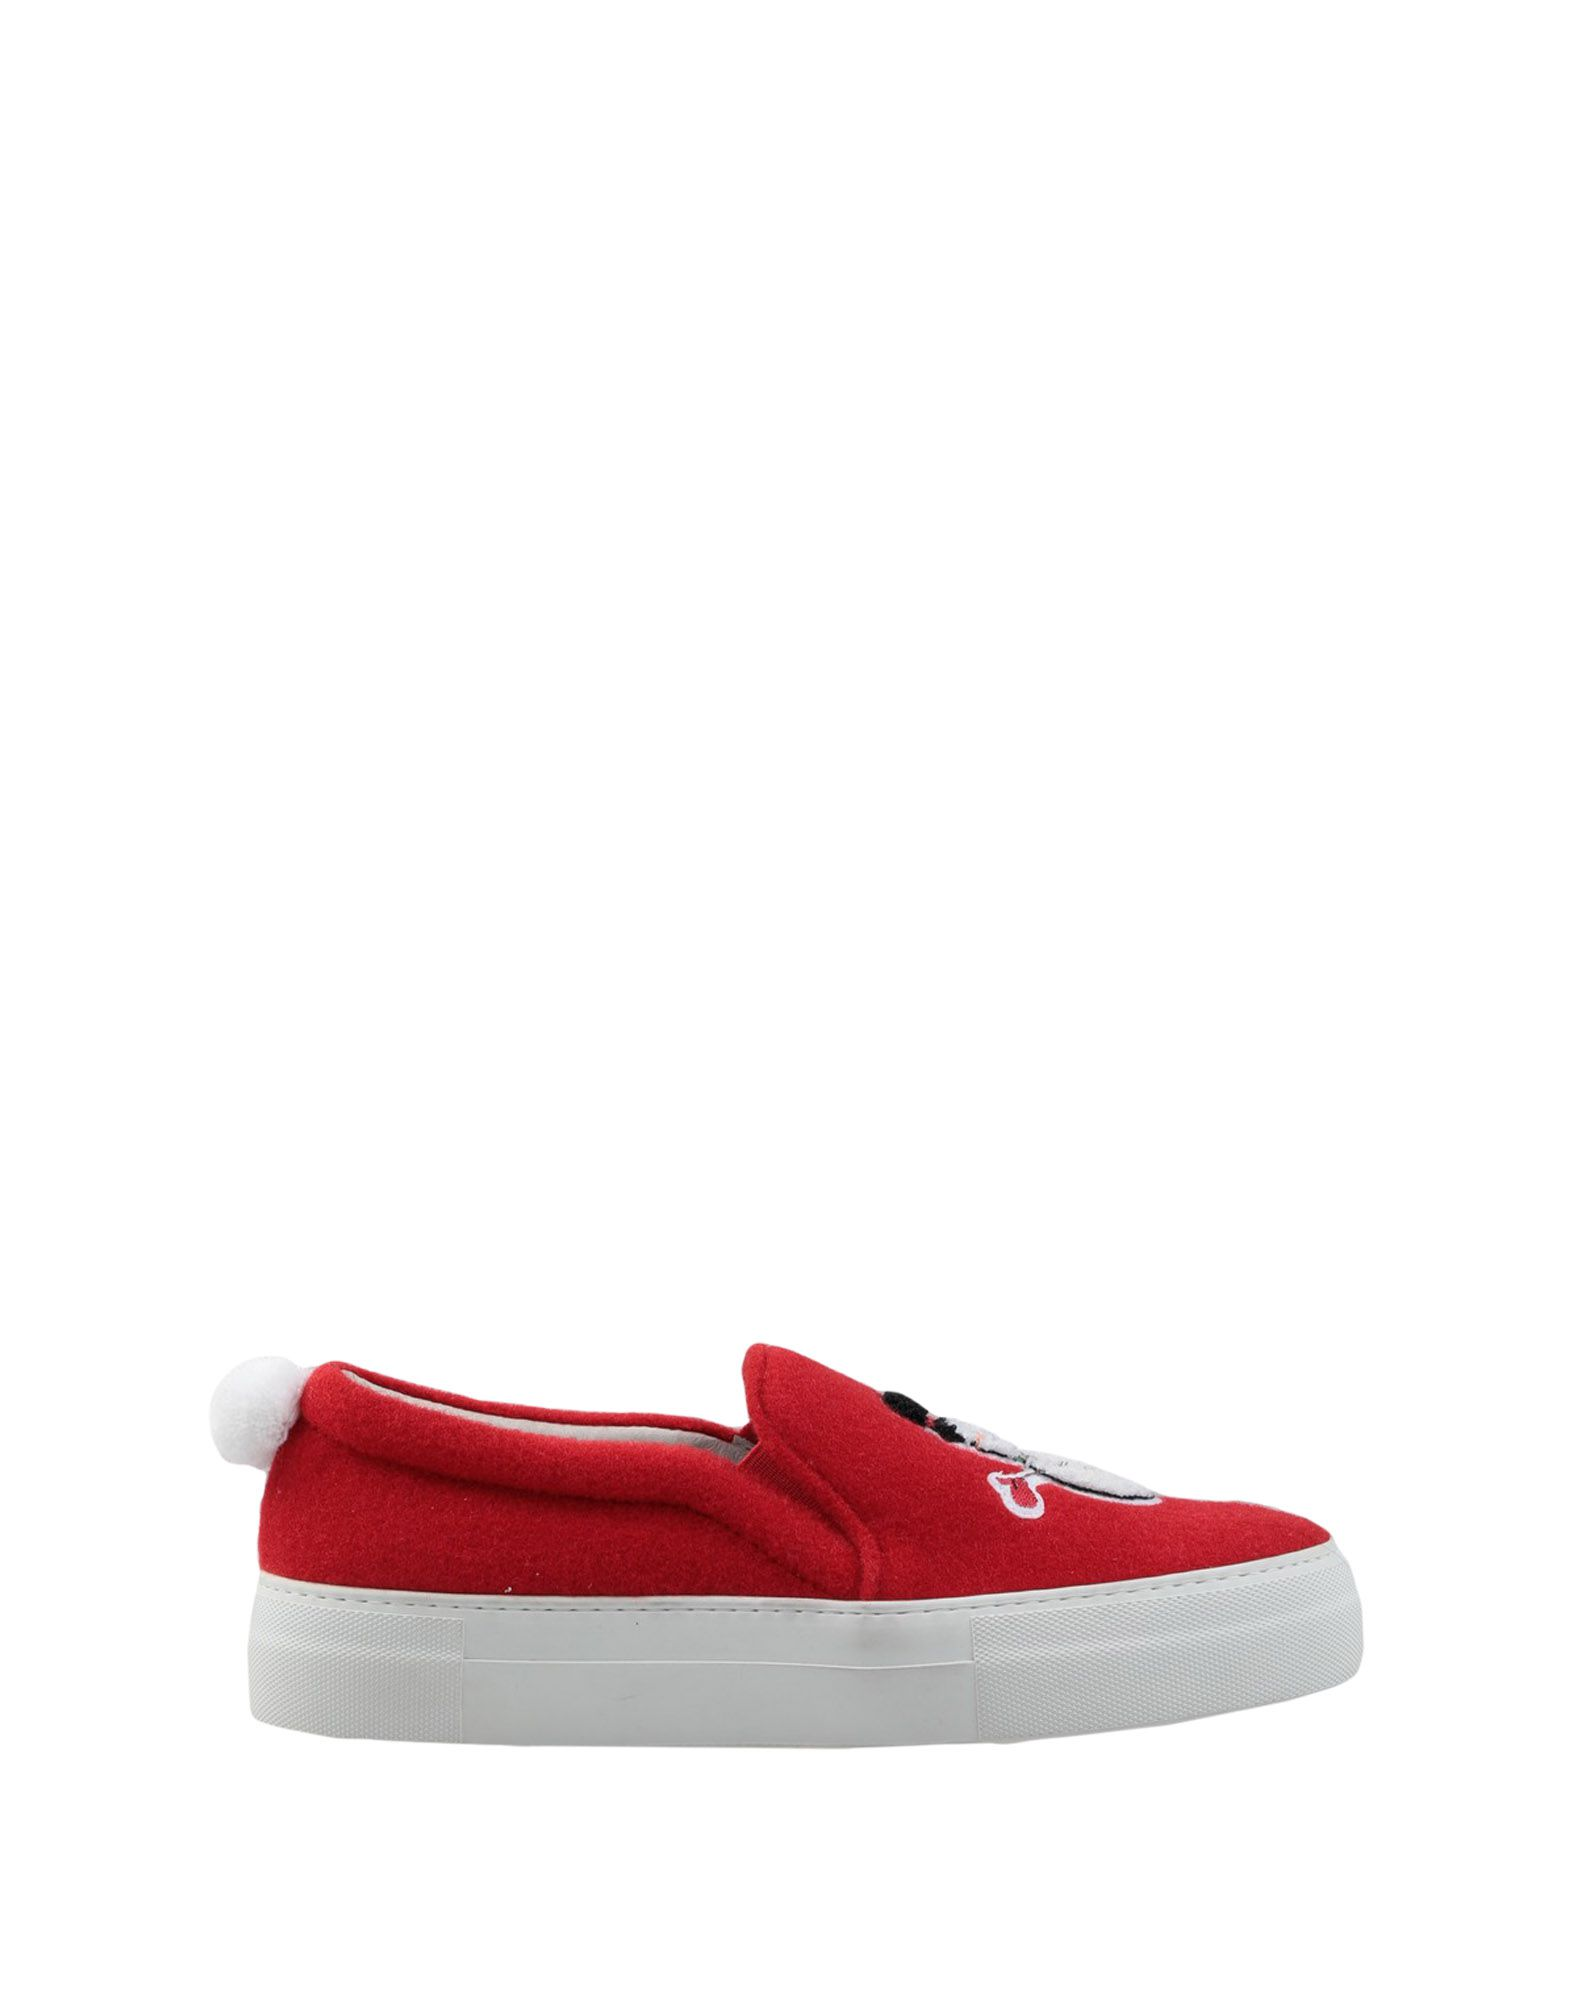 Joshua 11558196SP Sanders Sneakers Damen  11558196SP Joshua 6298e4